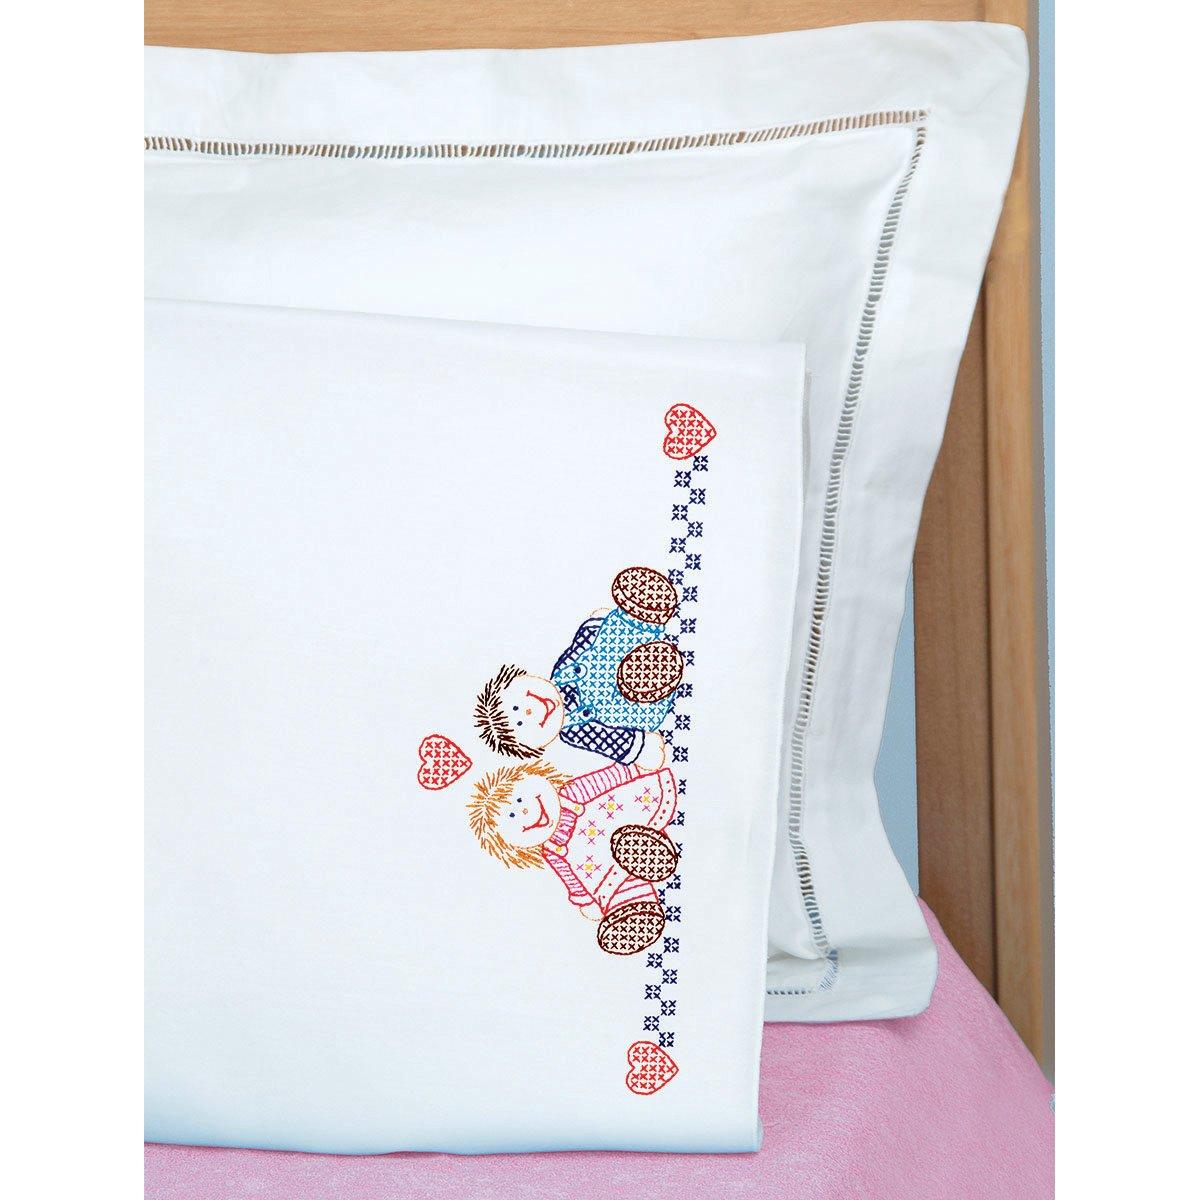 Ann & Andy Children's Pillowcase Jack Dempsey 1605 117